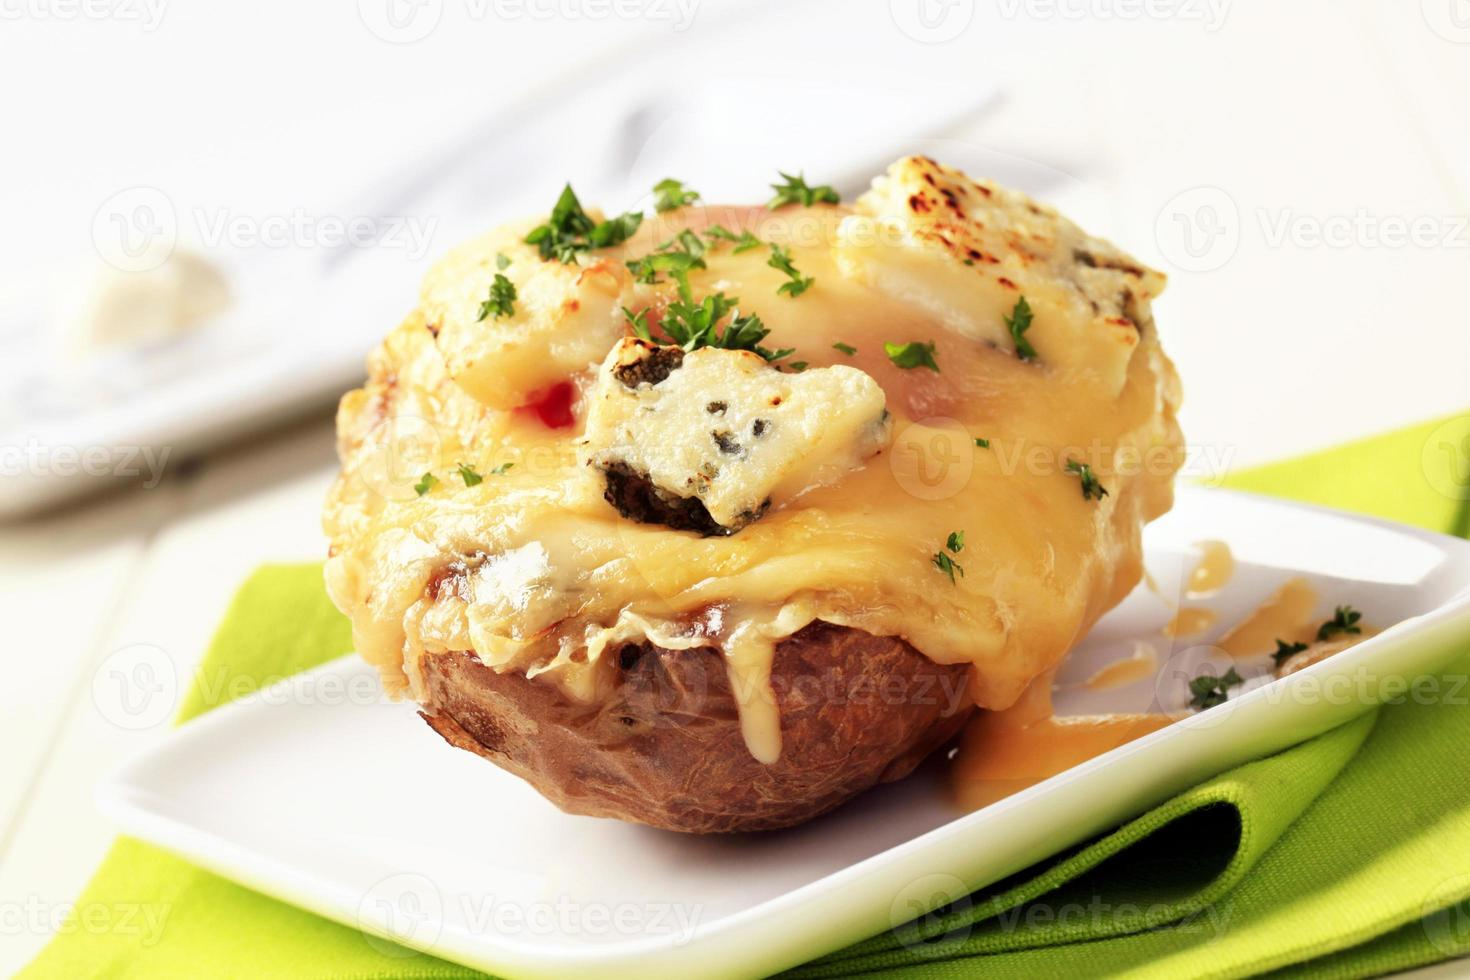 Double cheese twice baked potato photo